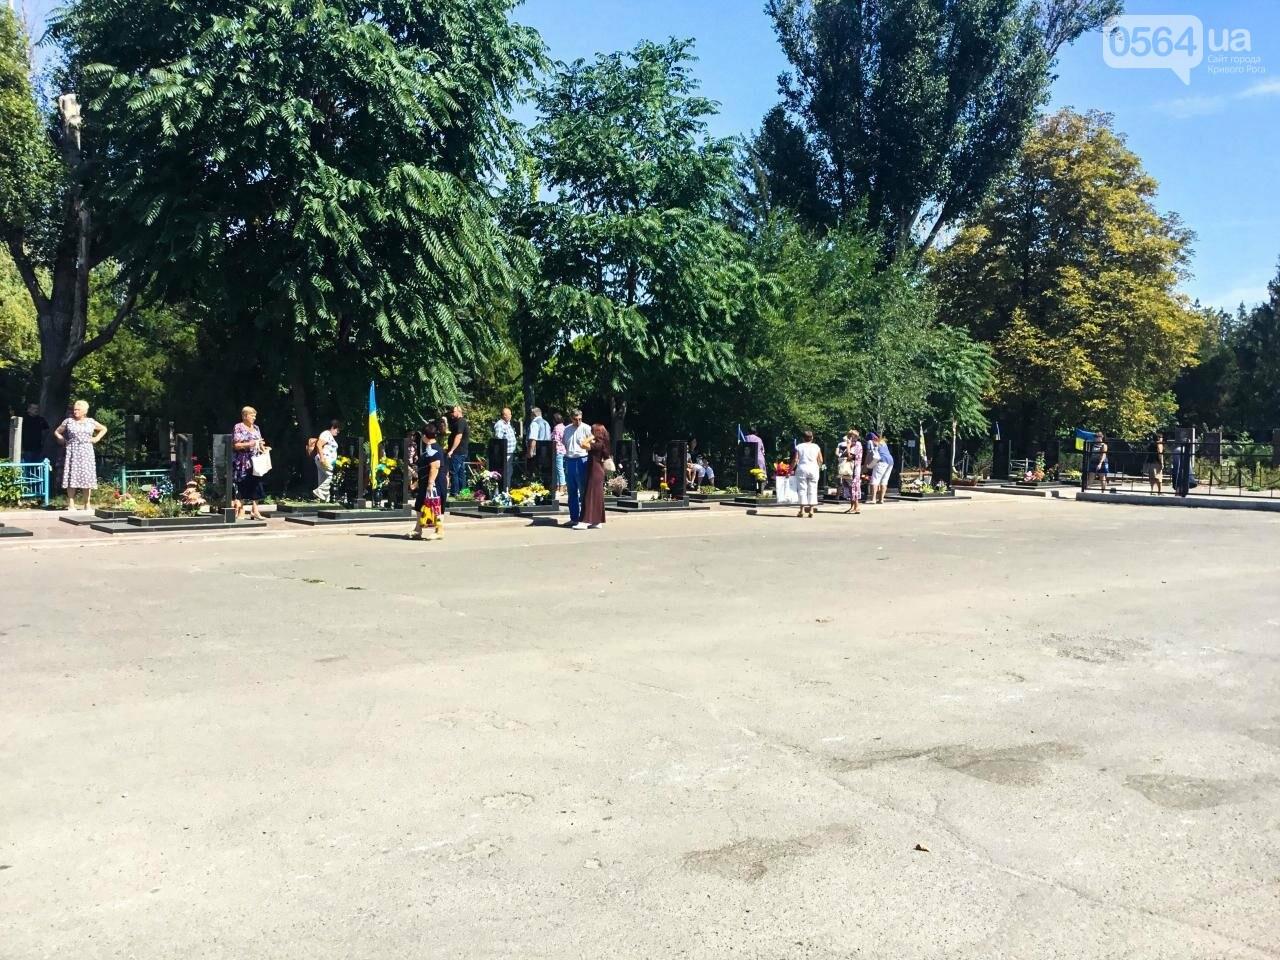 На Аллее Героев провели панихиду по погибшим в зоне АТО криворожанам, - ФОТО , фото-3